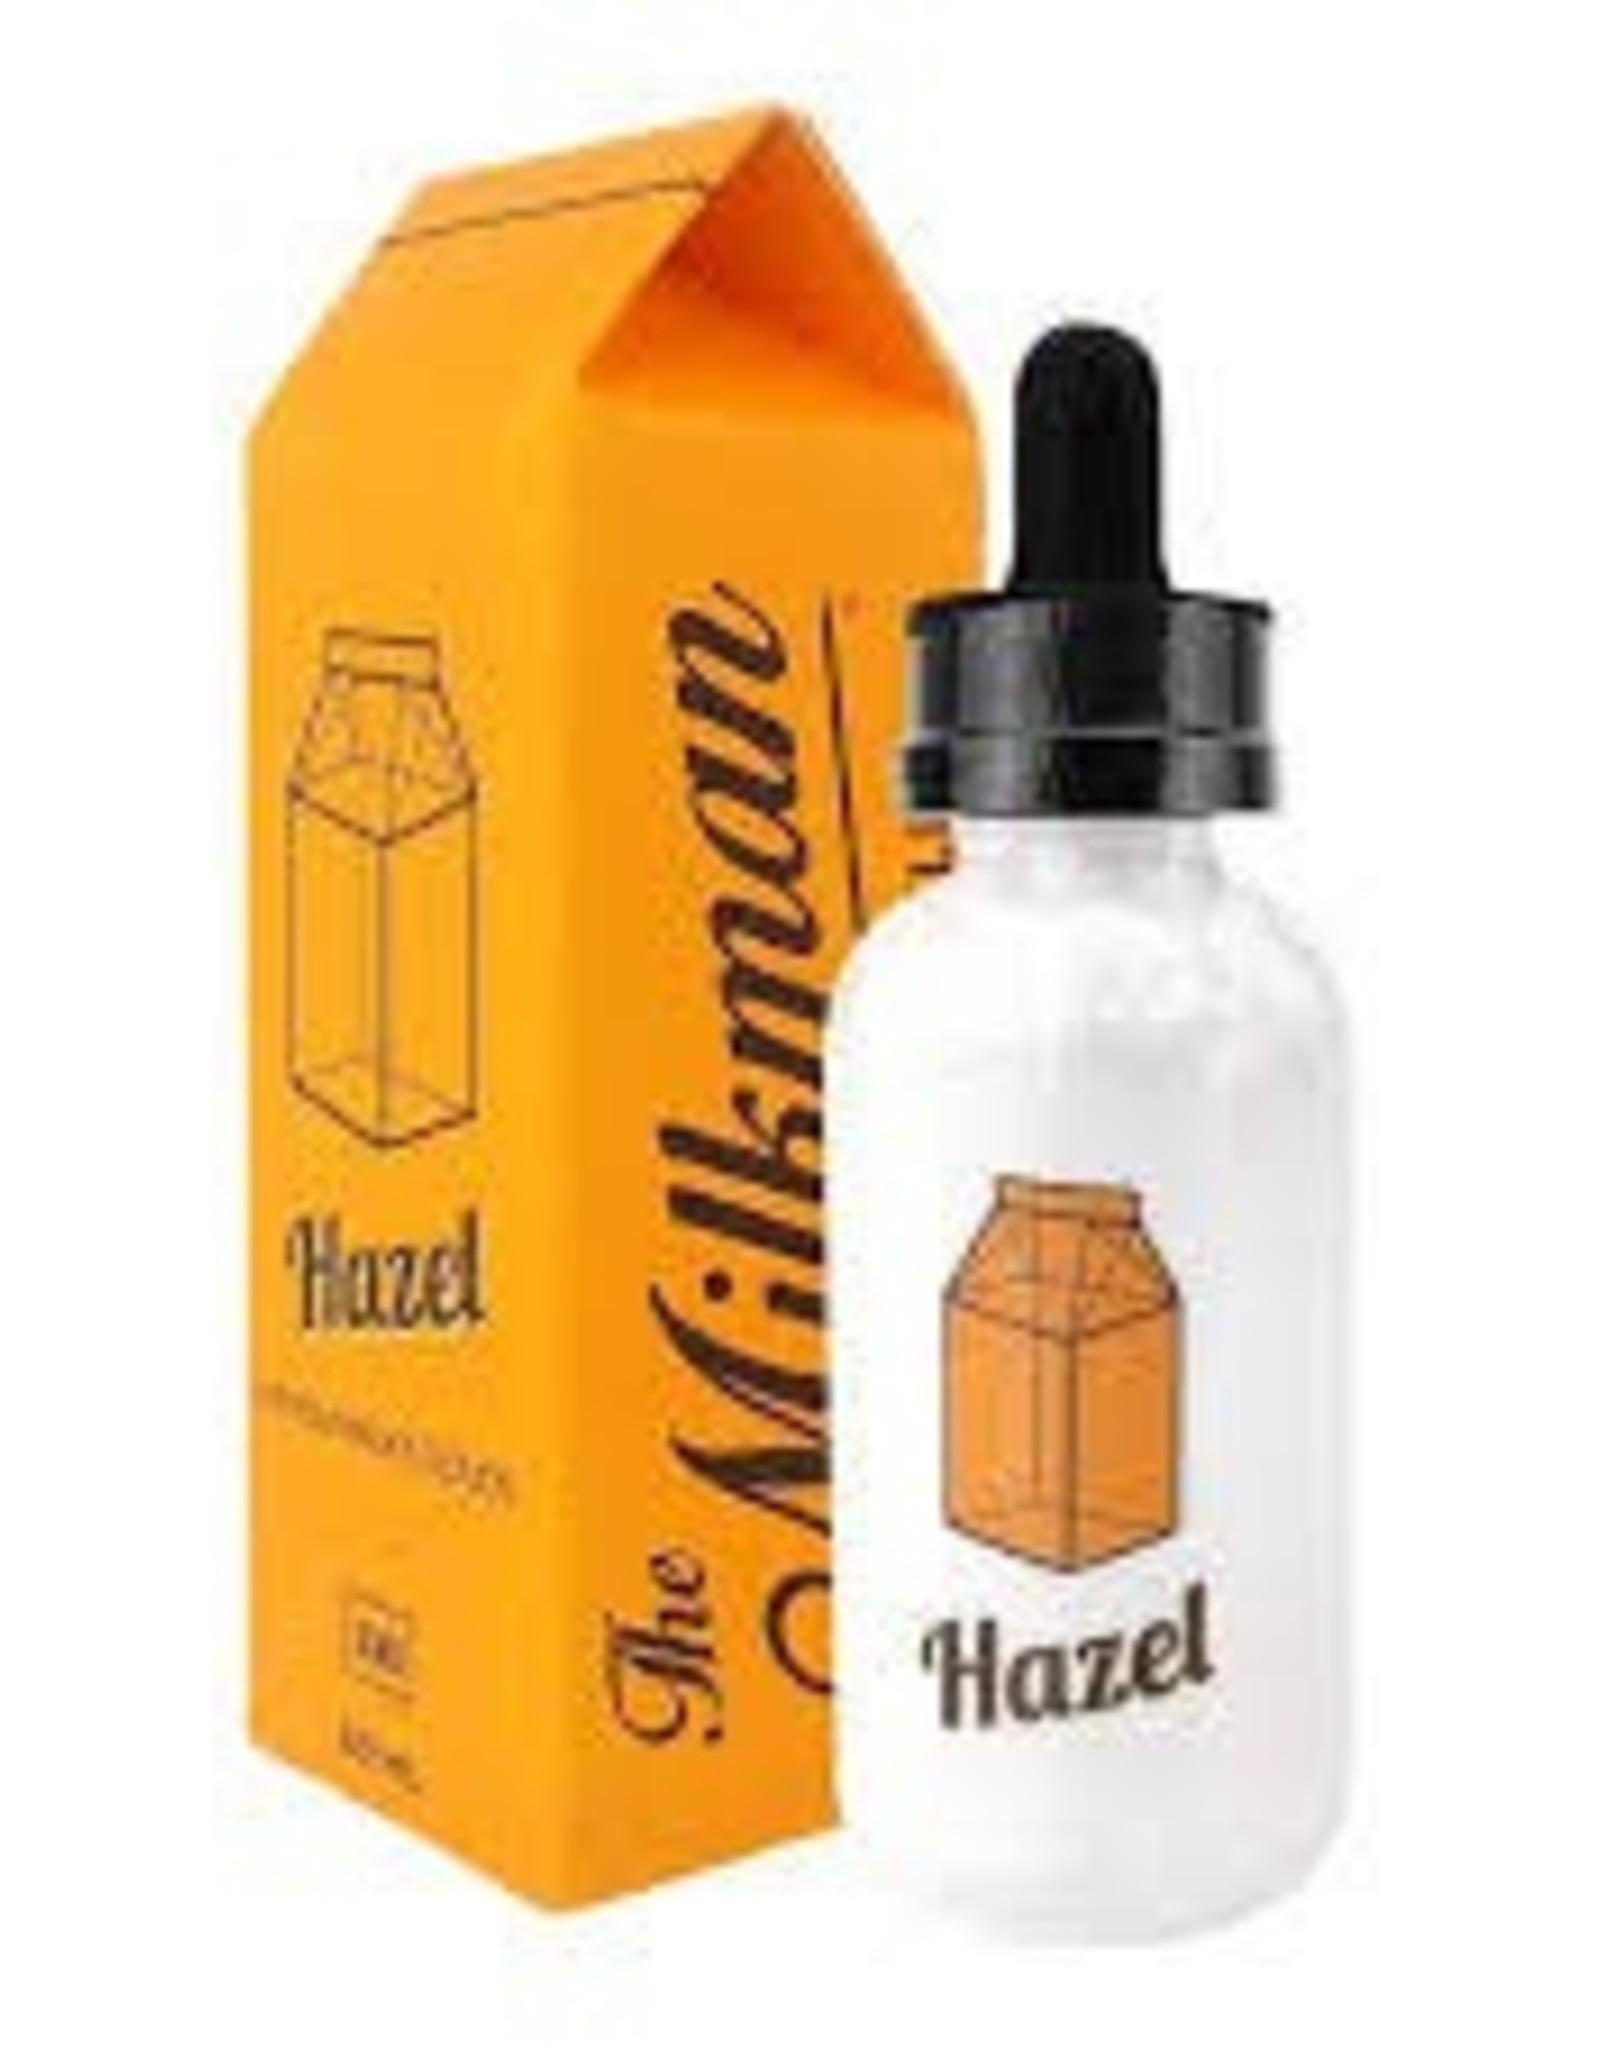 The Milkman The Milkman - Hazel (60mL)